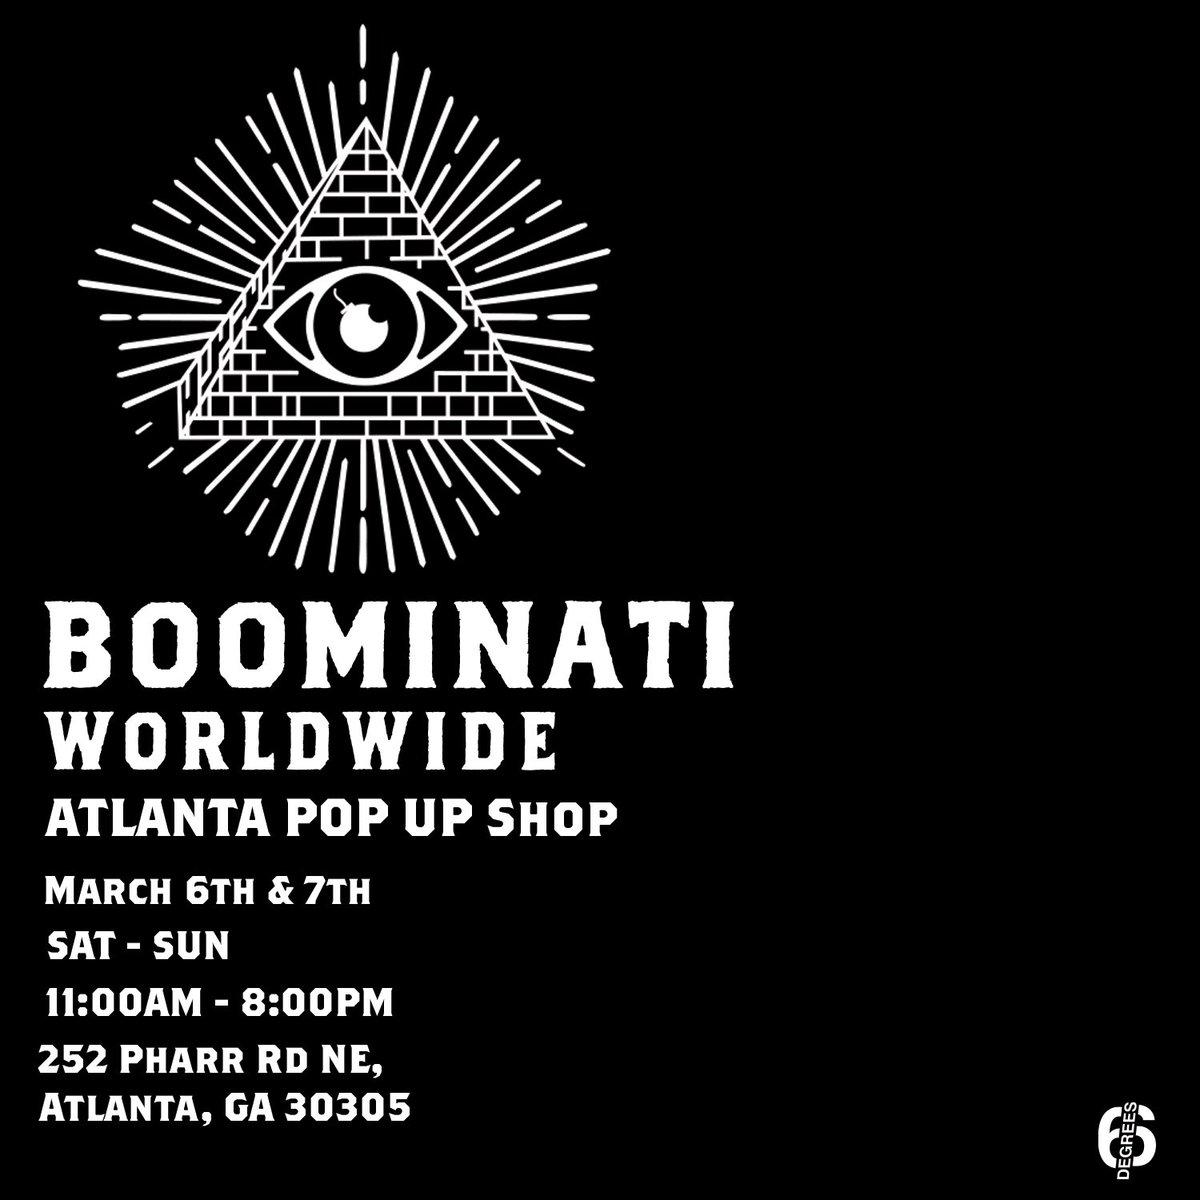 Boominati All-Star weekend come thru the pop up 👁 https://t.co/YKQr4zG9l2